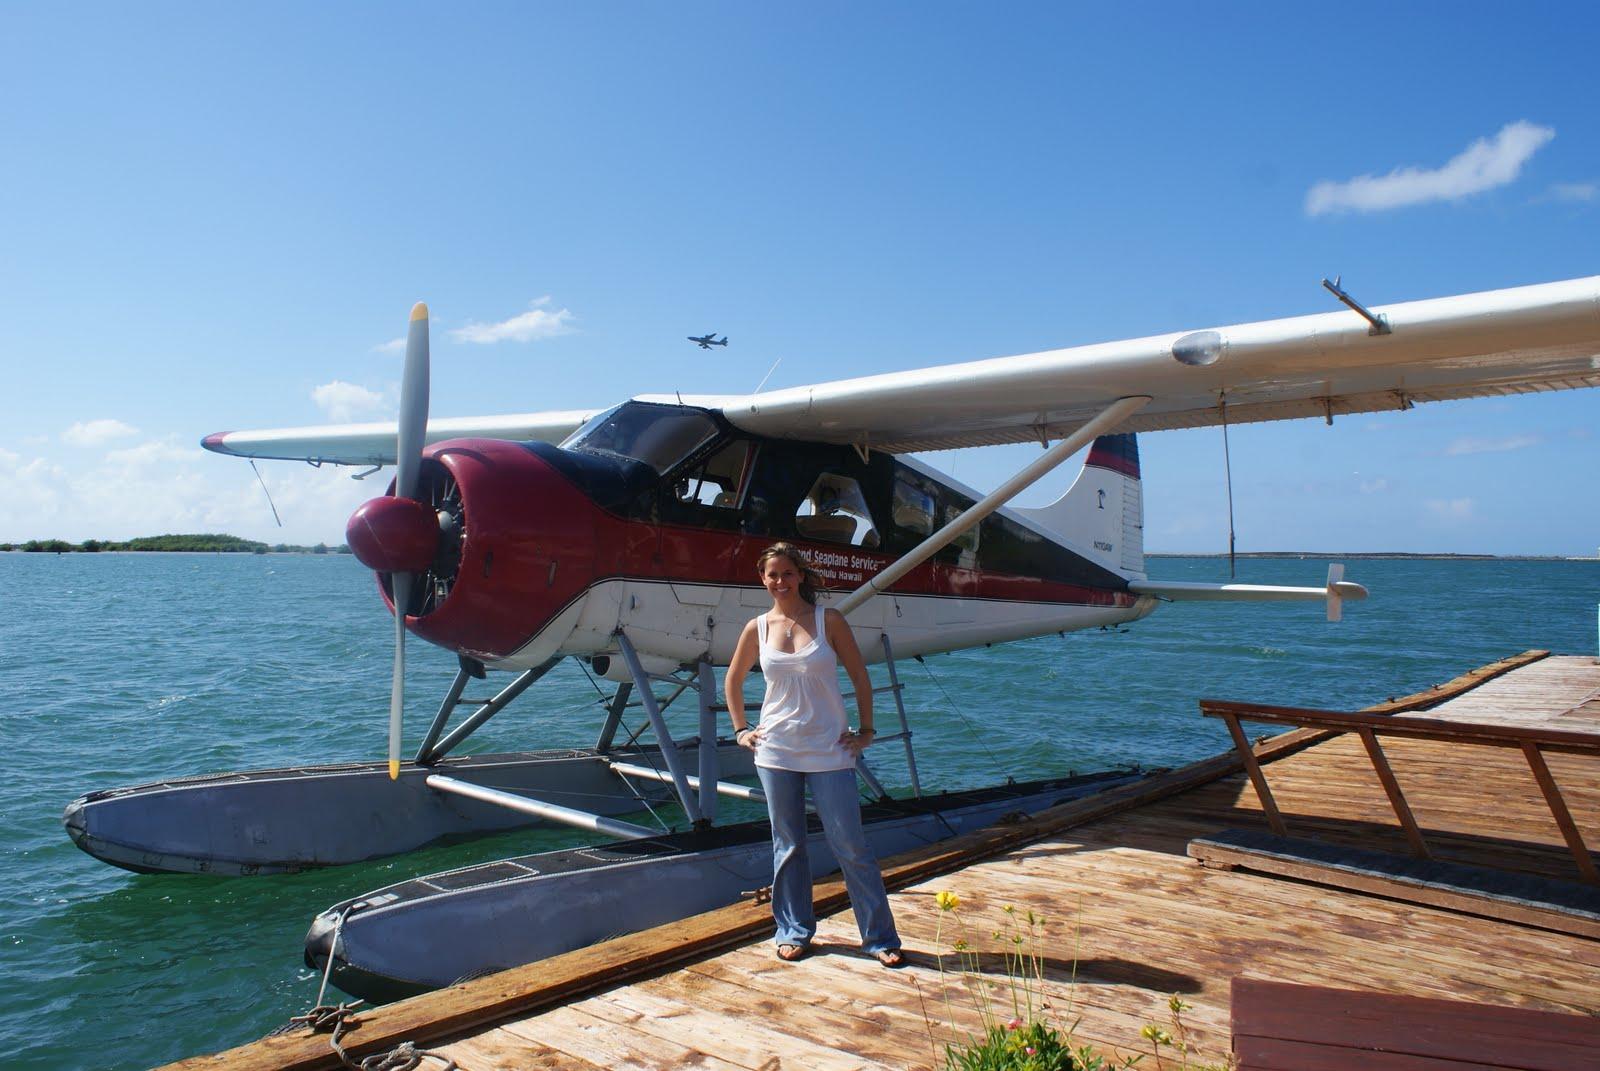 Wallpaper Aeroplane Download